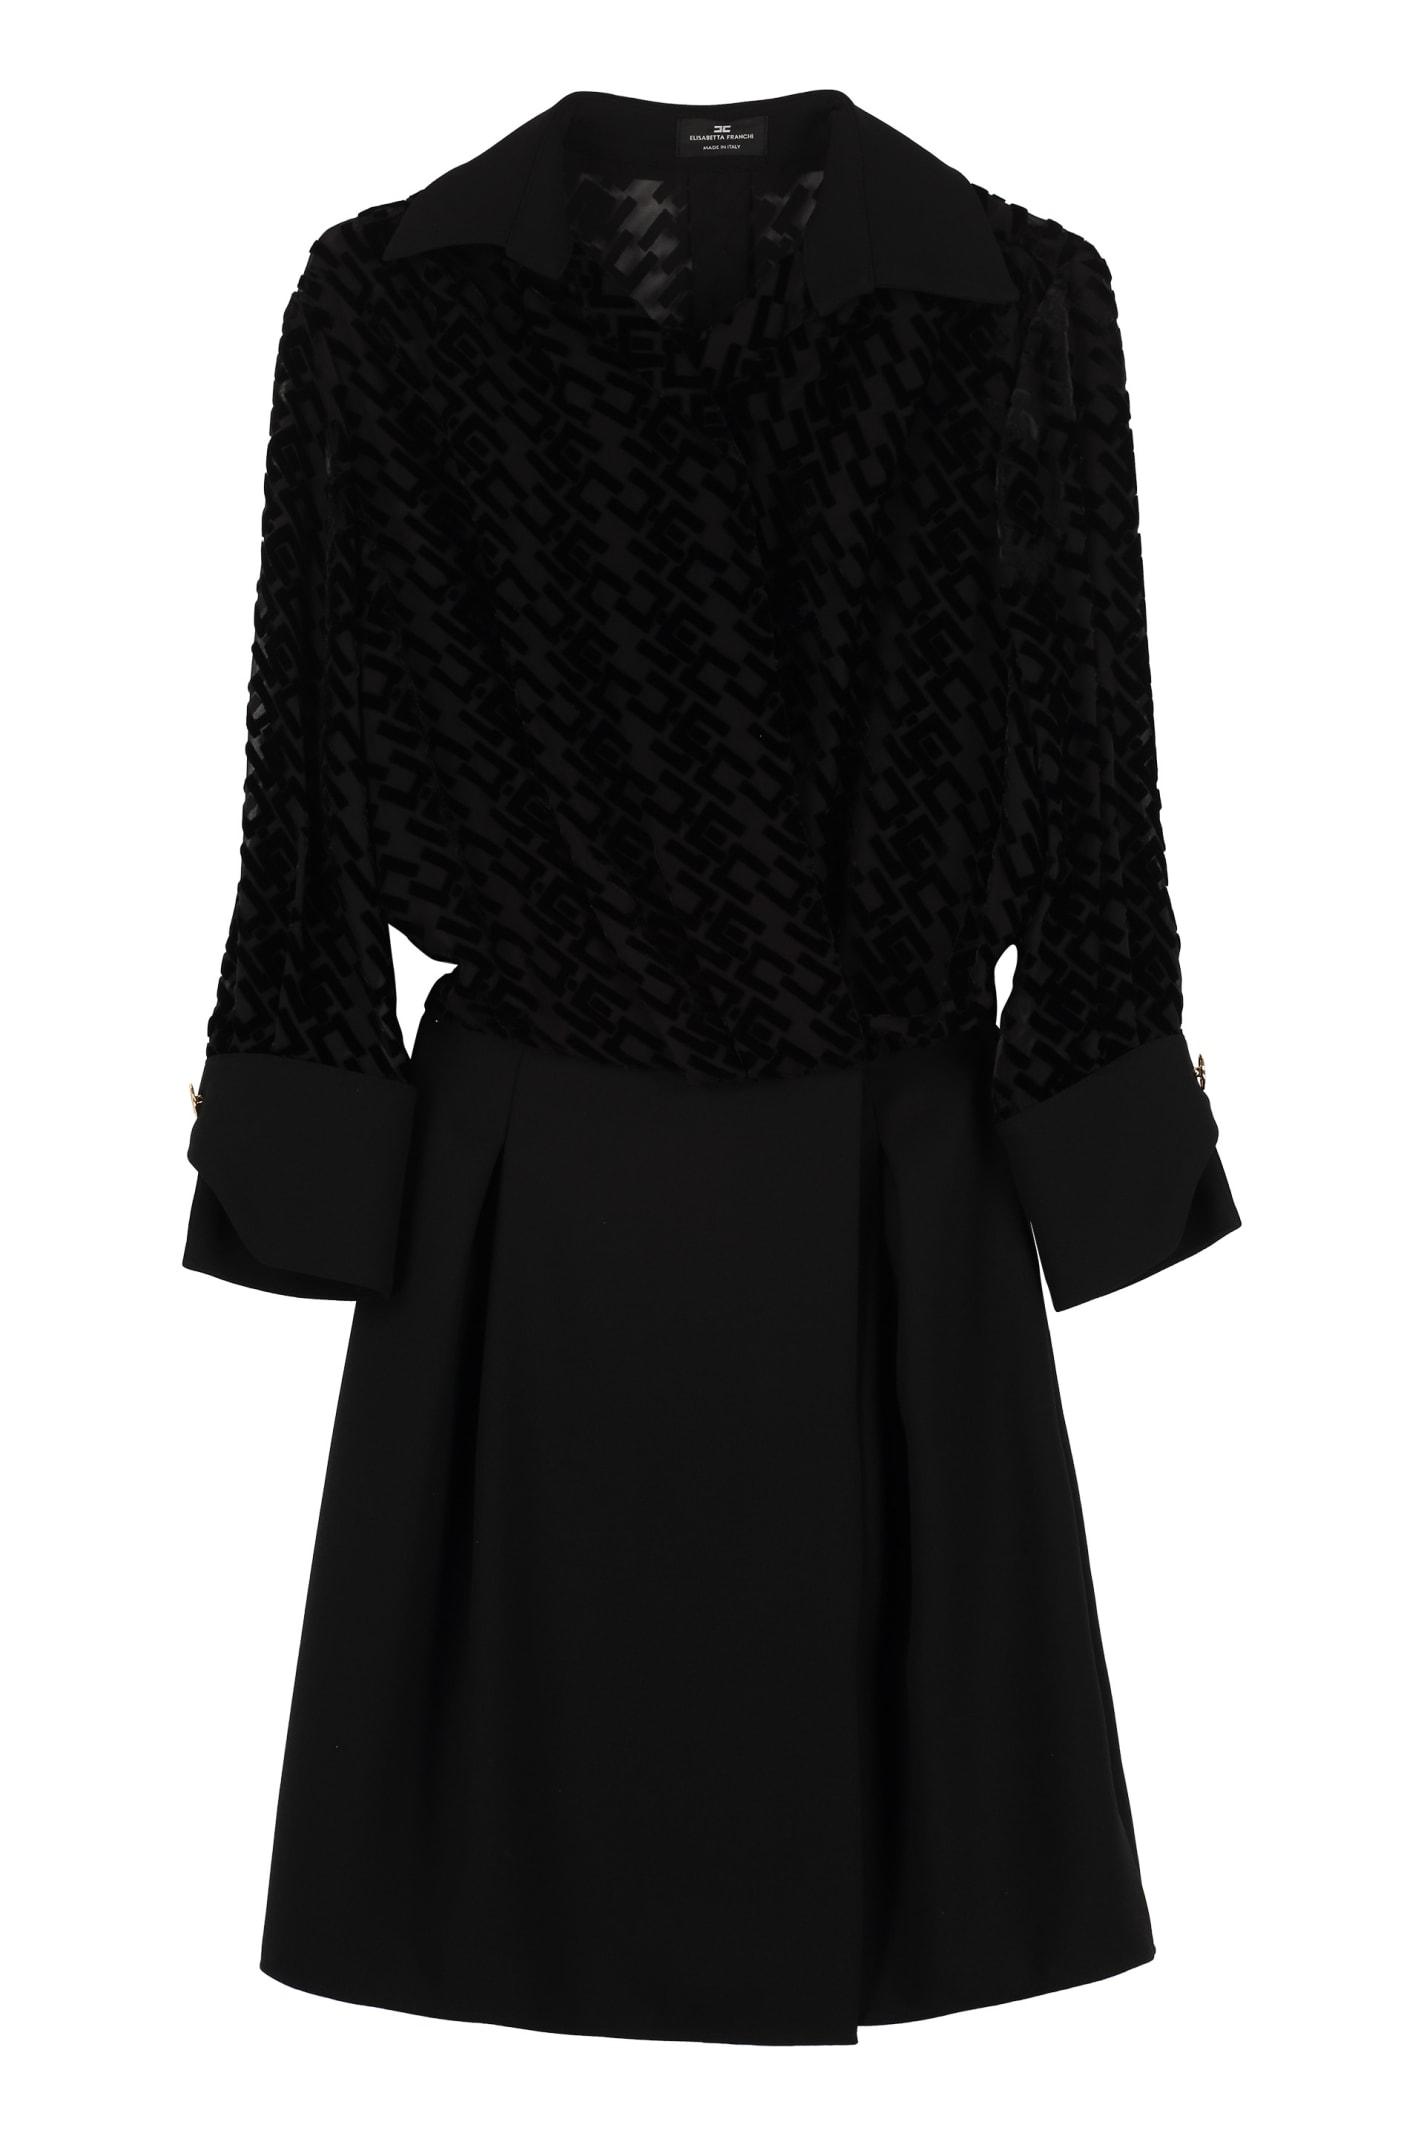 Elisabetta Franchi Celyn B. Devoré Logo Dress